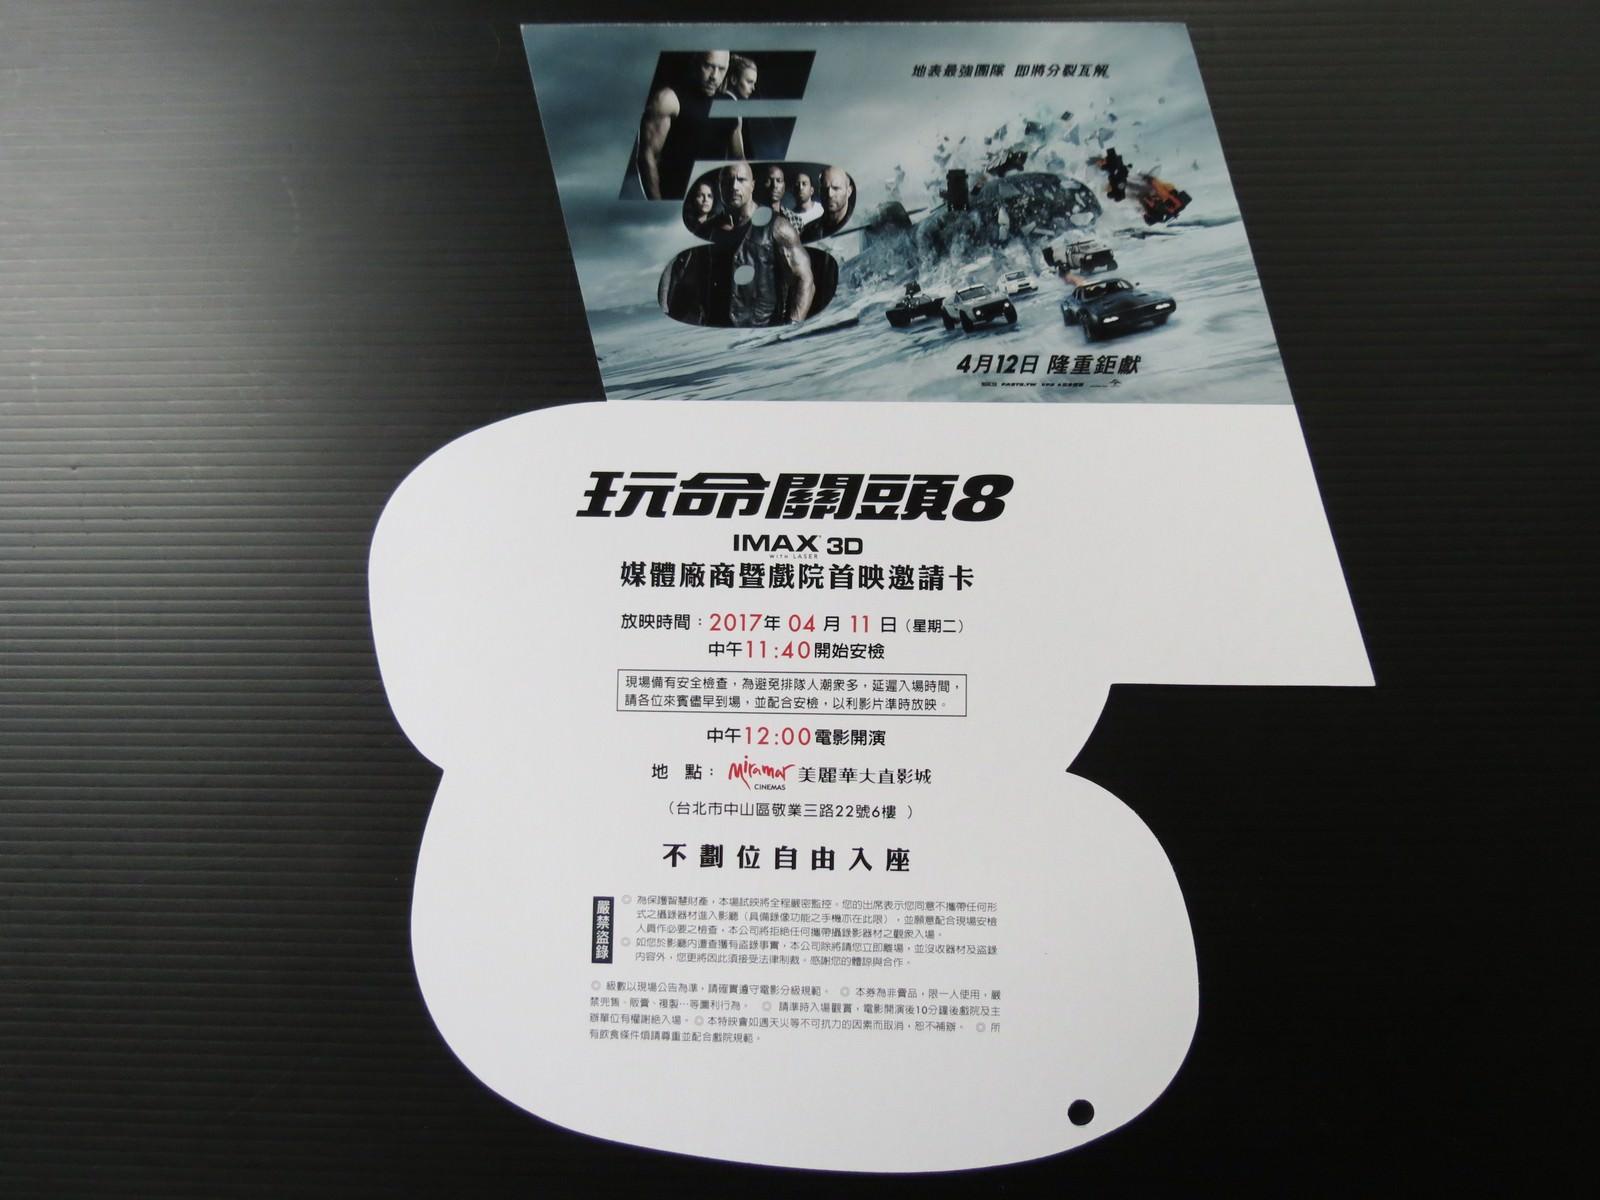 Movie, The Fate of the Furious(美國, 2017年) / 玩命關頭8(台灣) / 速度与激情8(中國) / 狂野時速8(香港), 特映會邀請卡